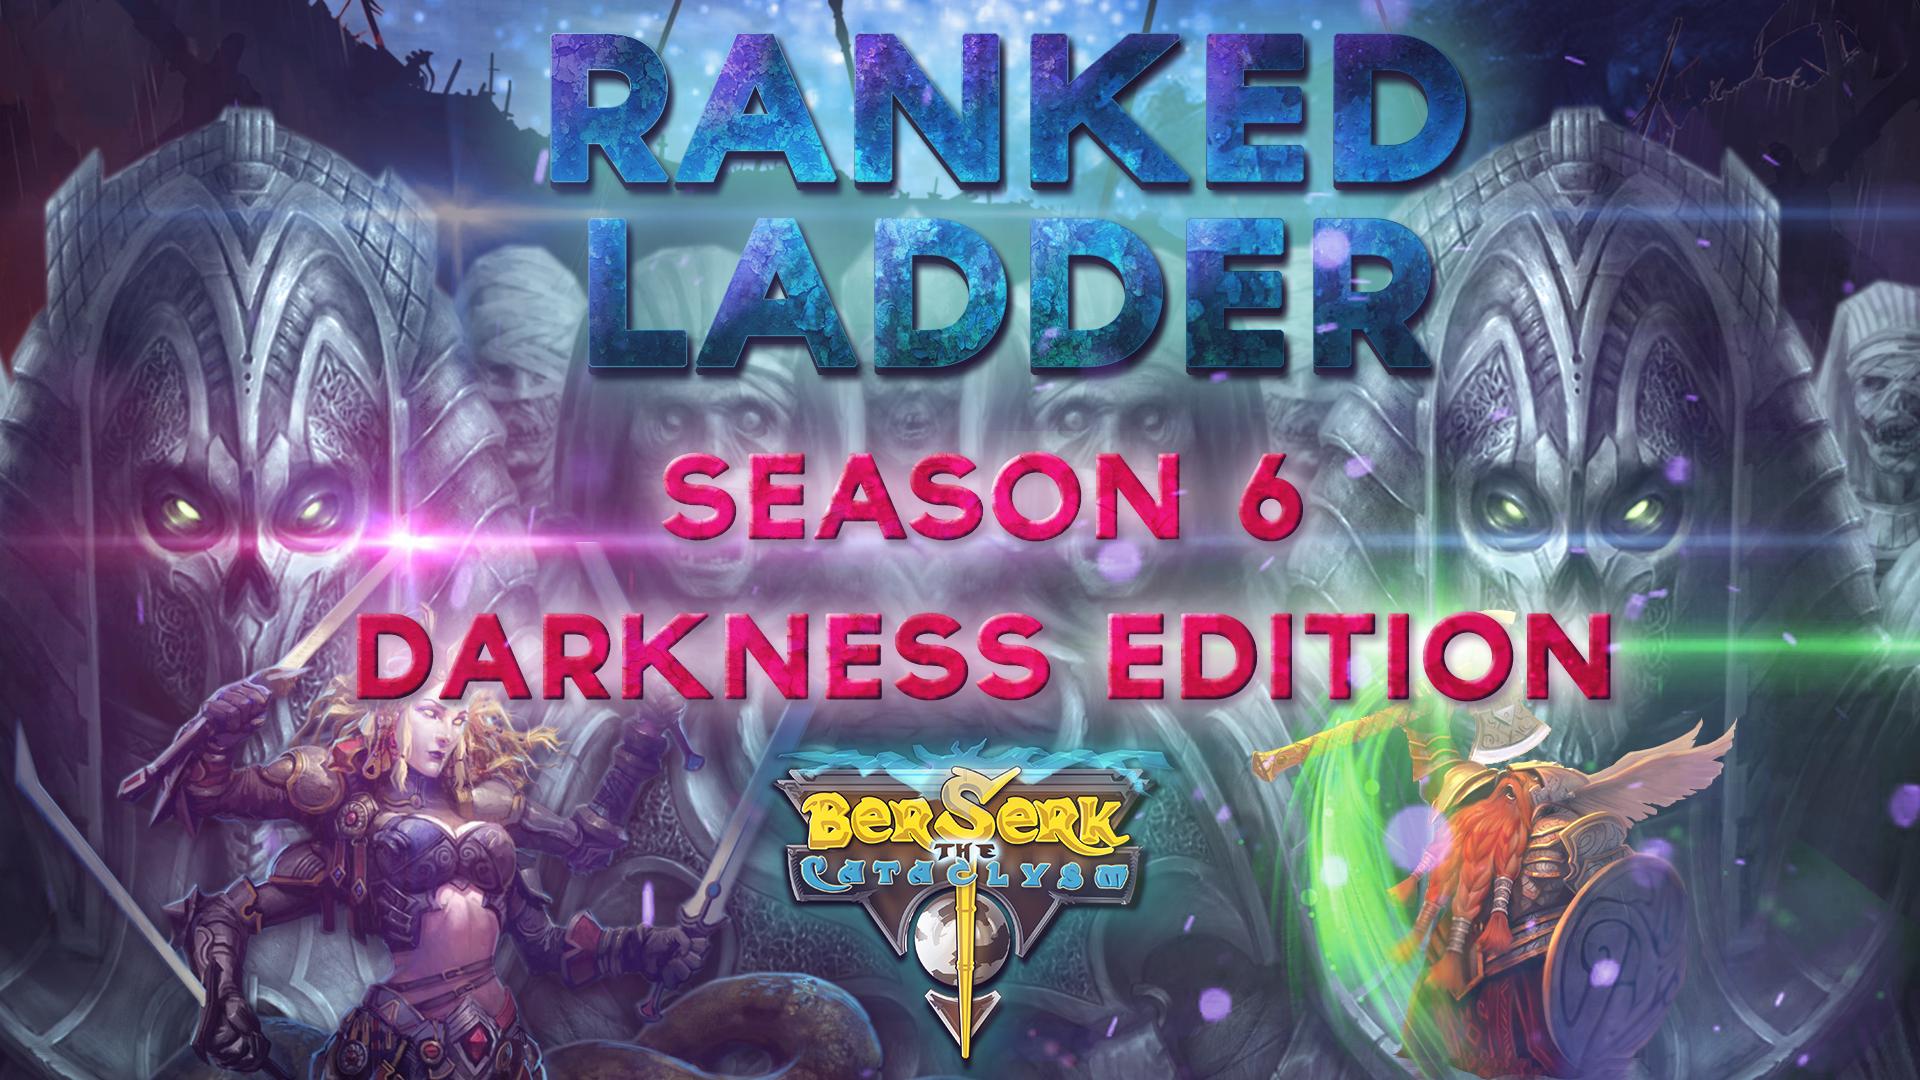 Ranked_LAdder_Season_6.jpg